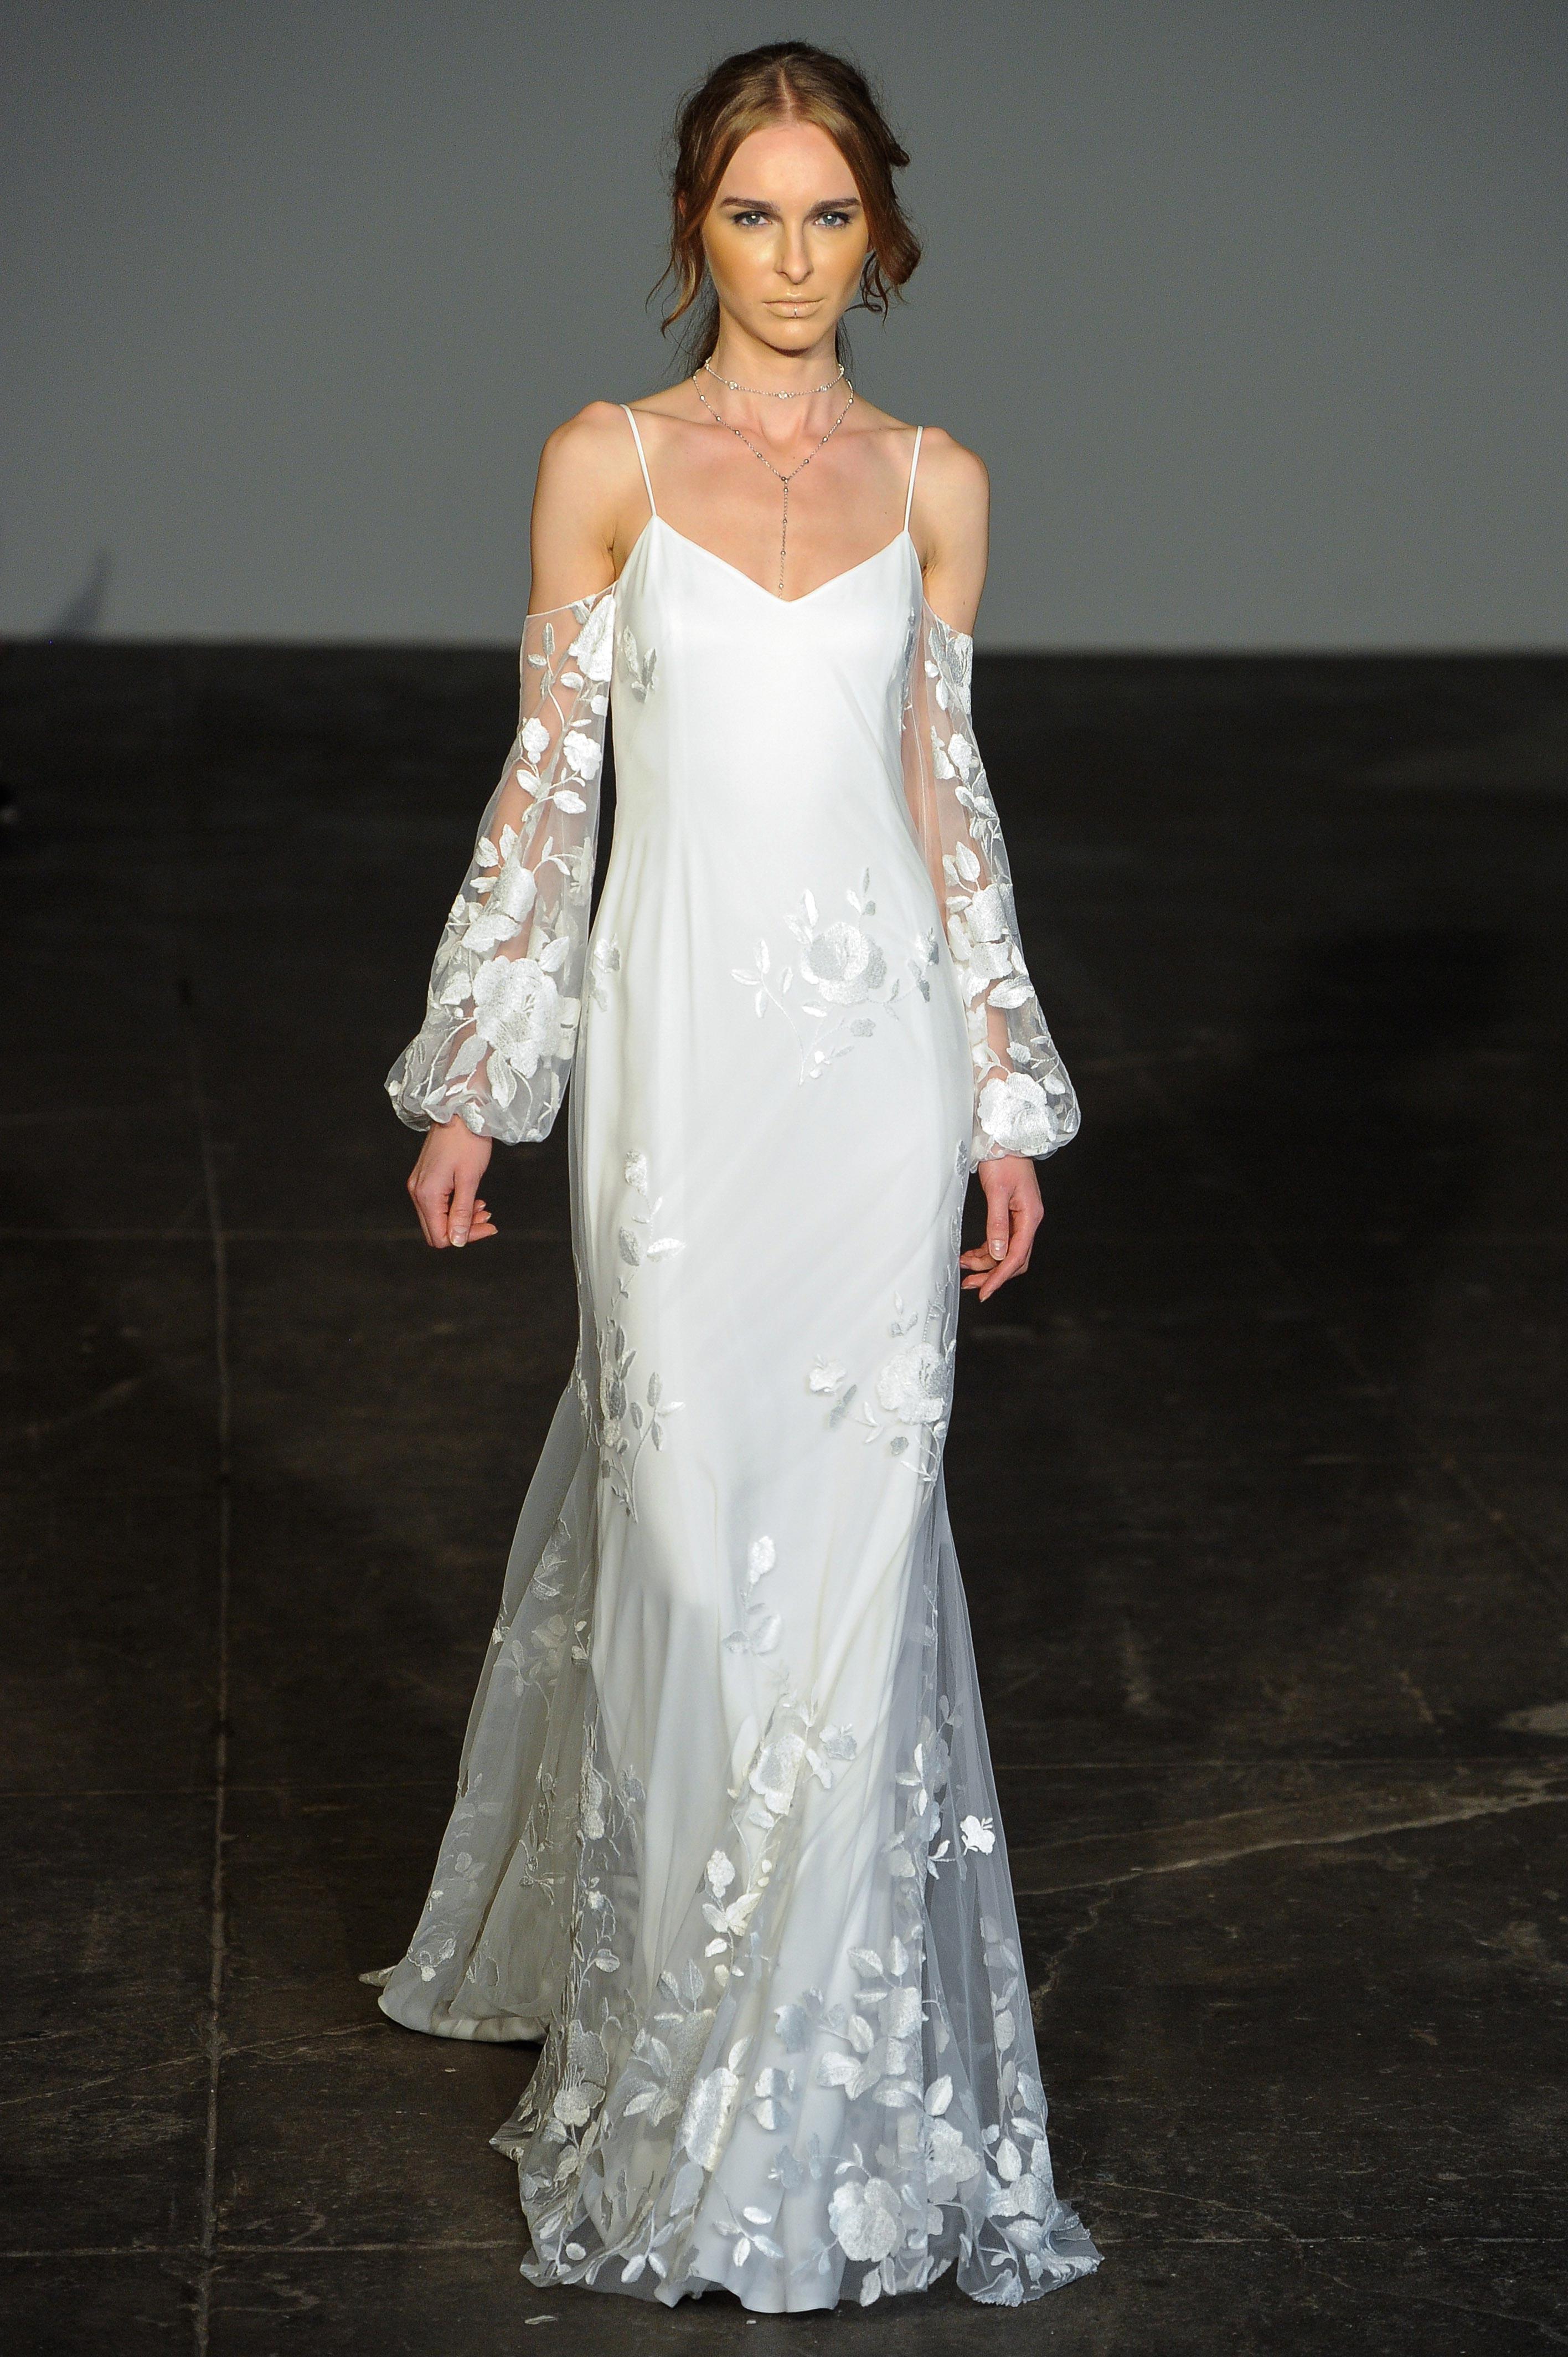 rime arodaky fall 2018 spaghetti strap wedding dress